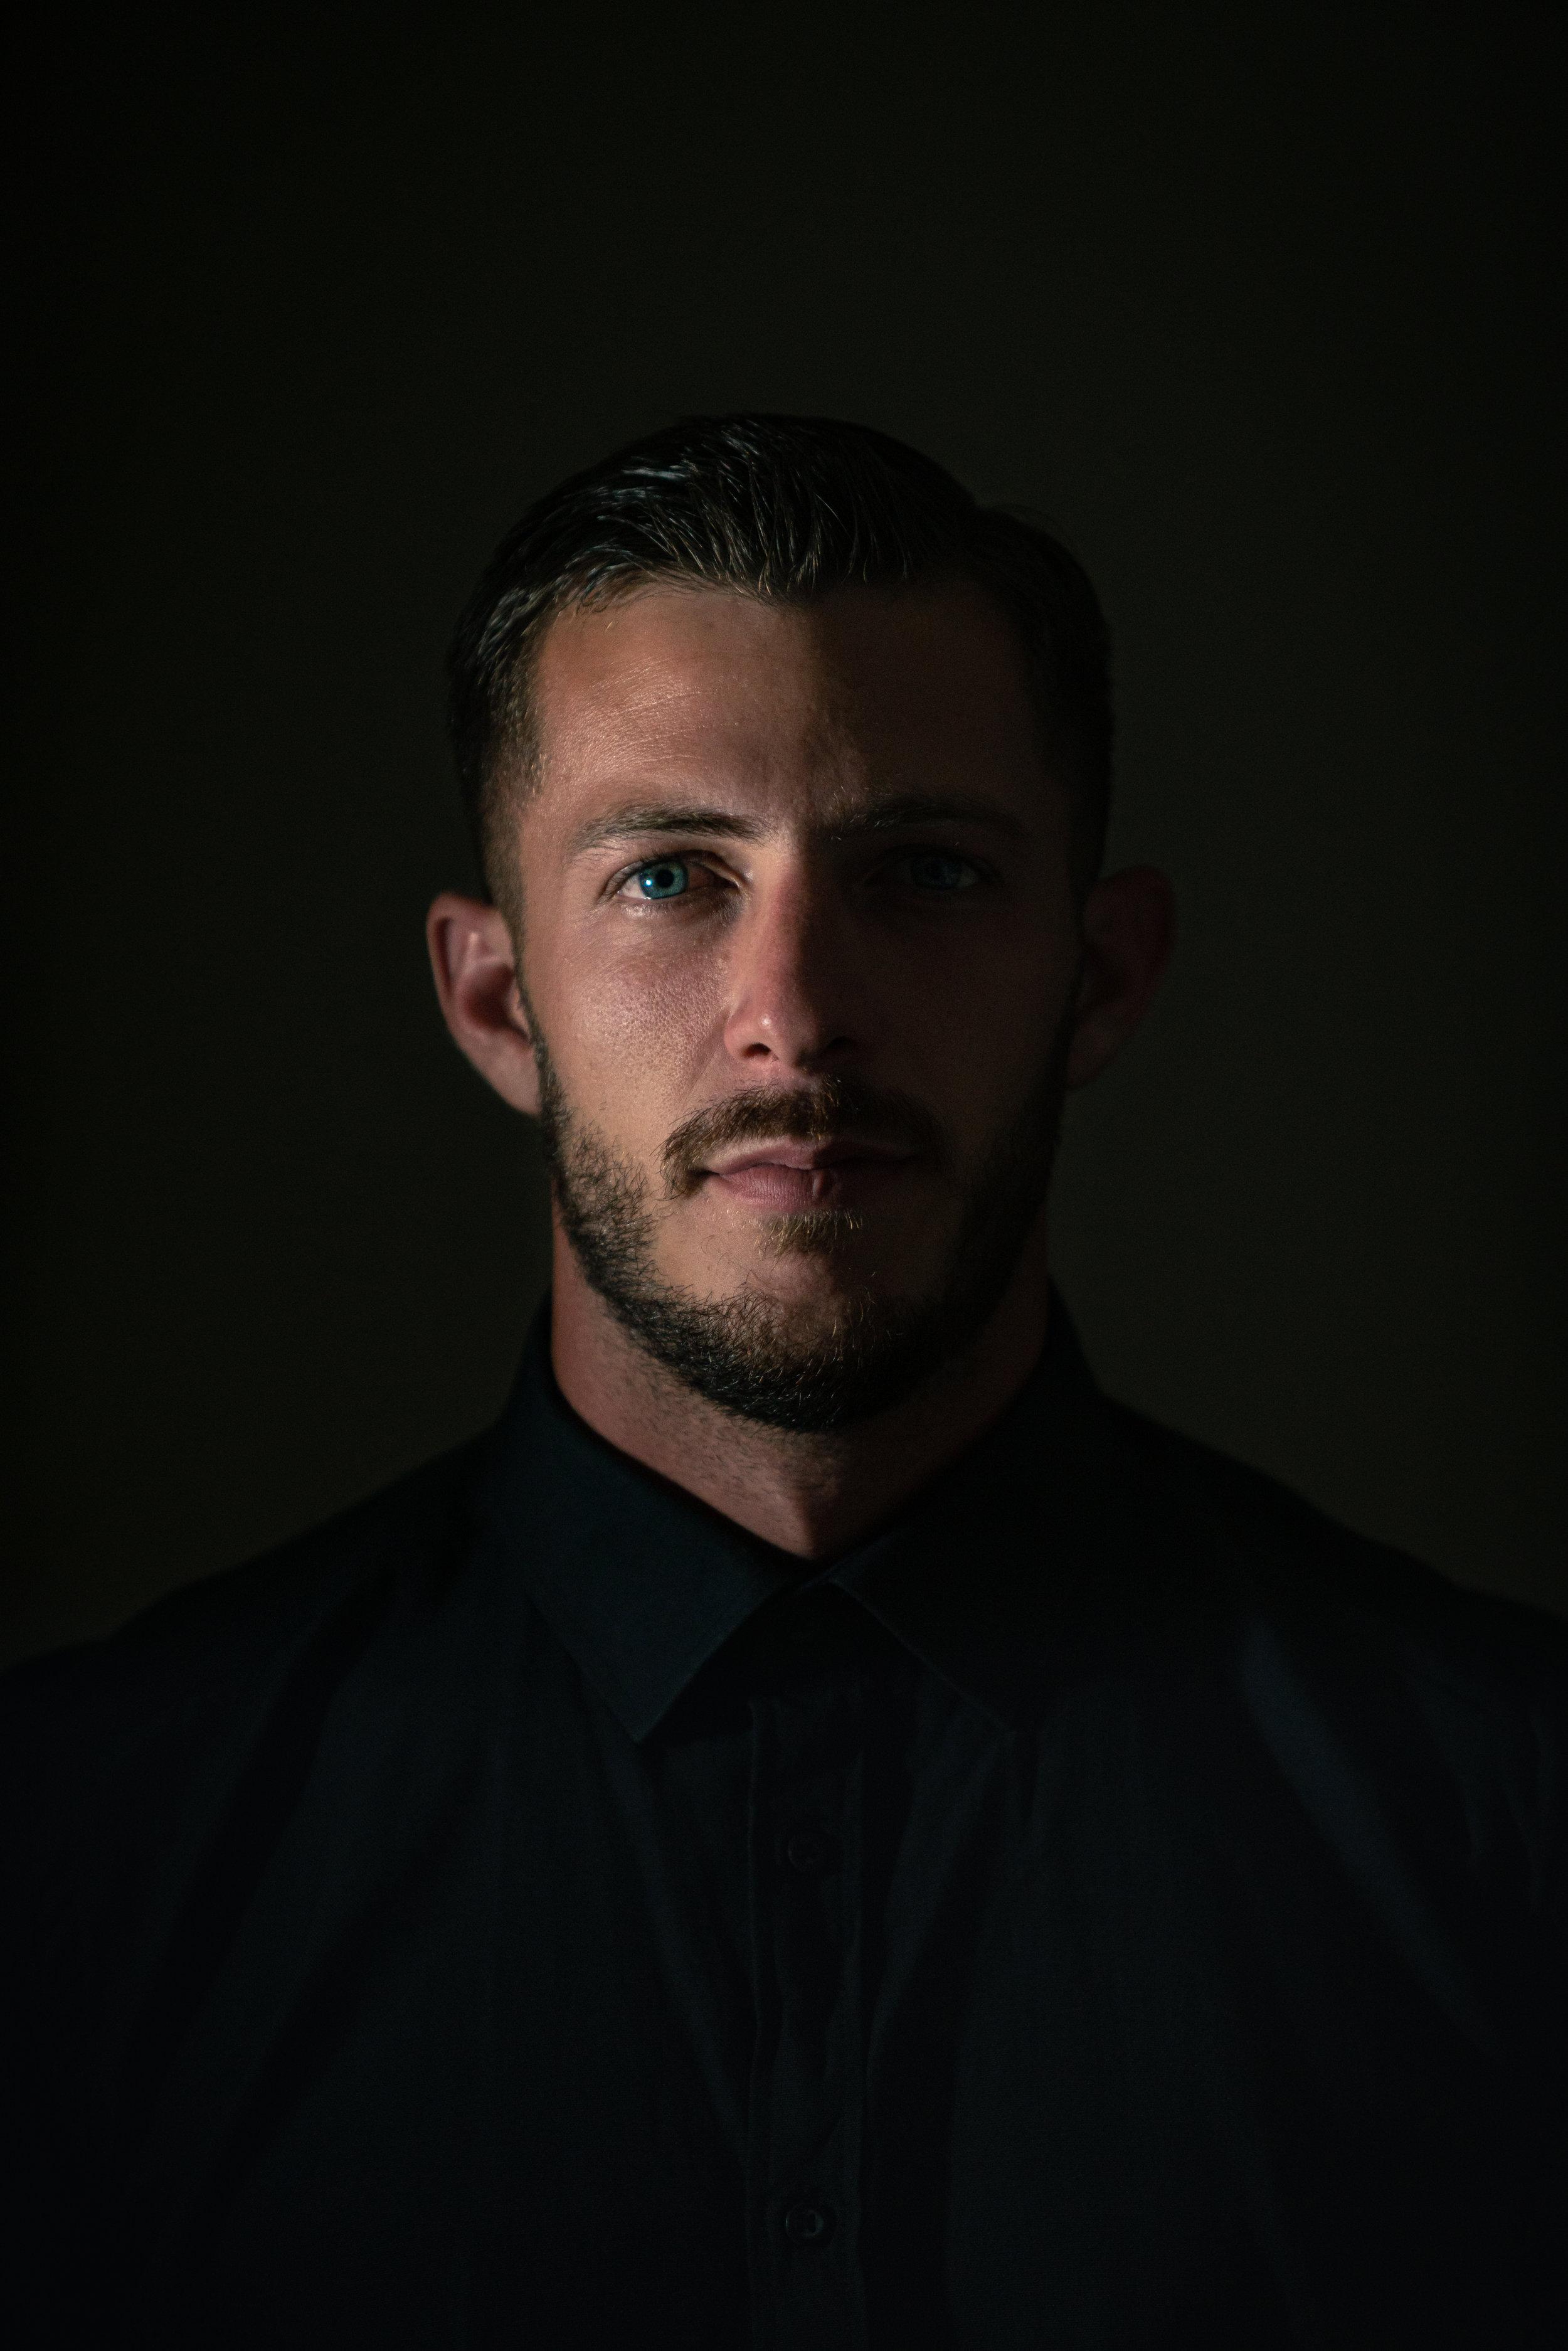 Model: Jim Baron